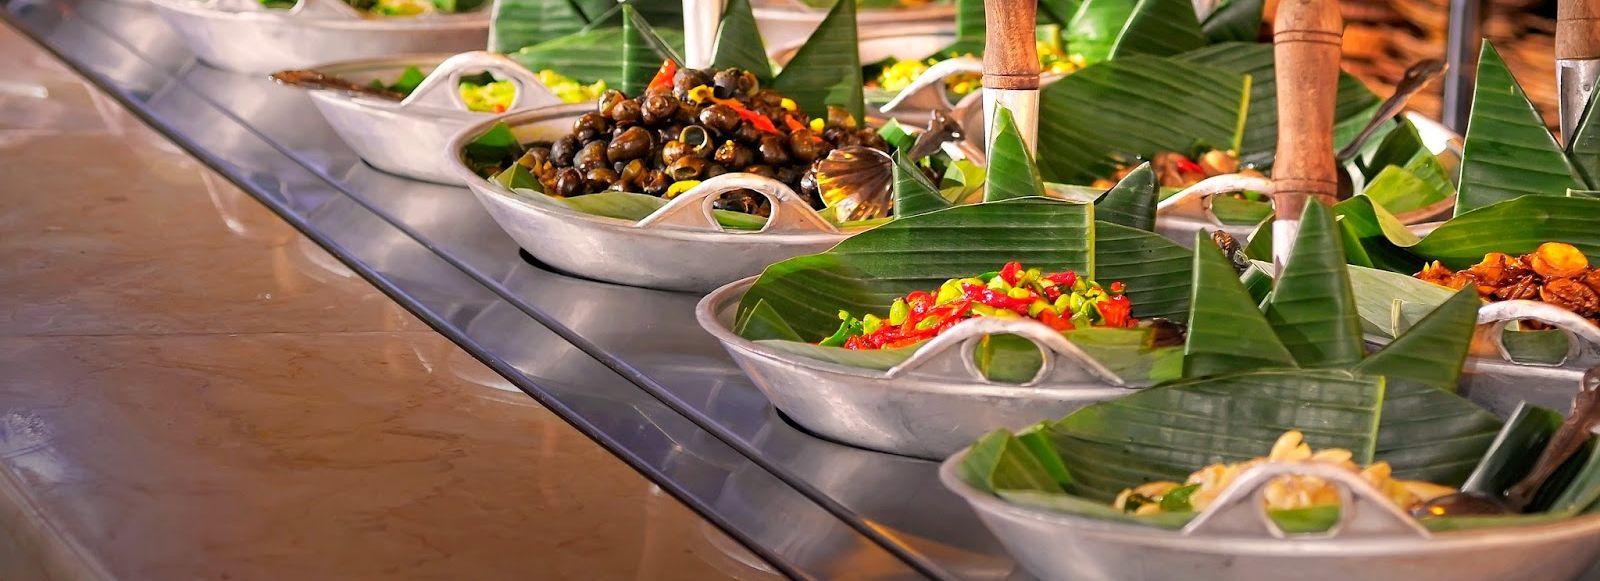 5 Rekomendasi Tempat Buka Puasa di Bandung